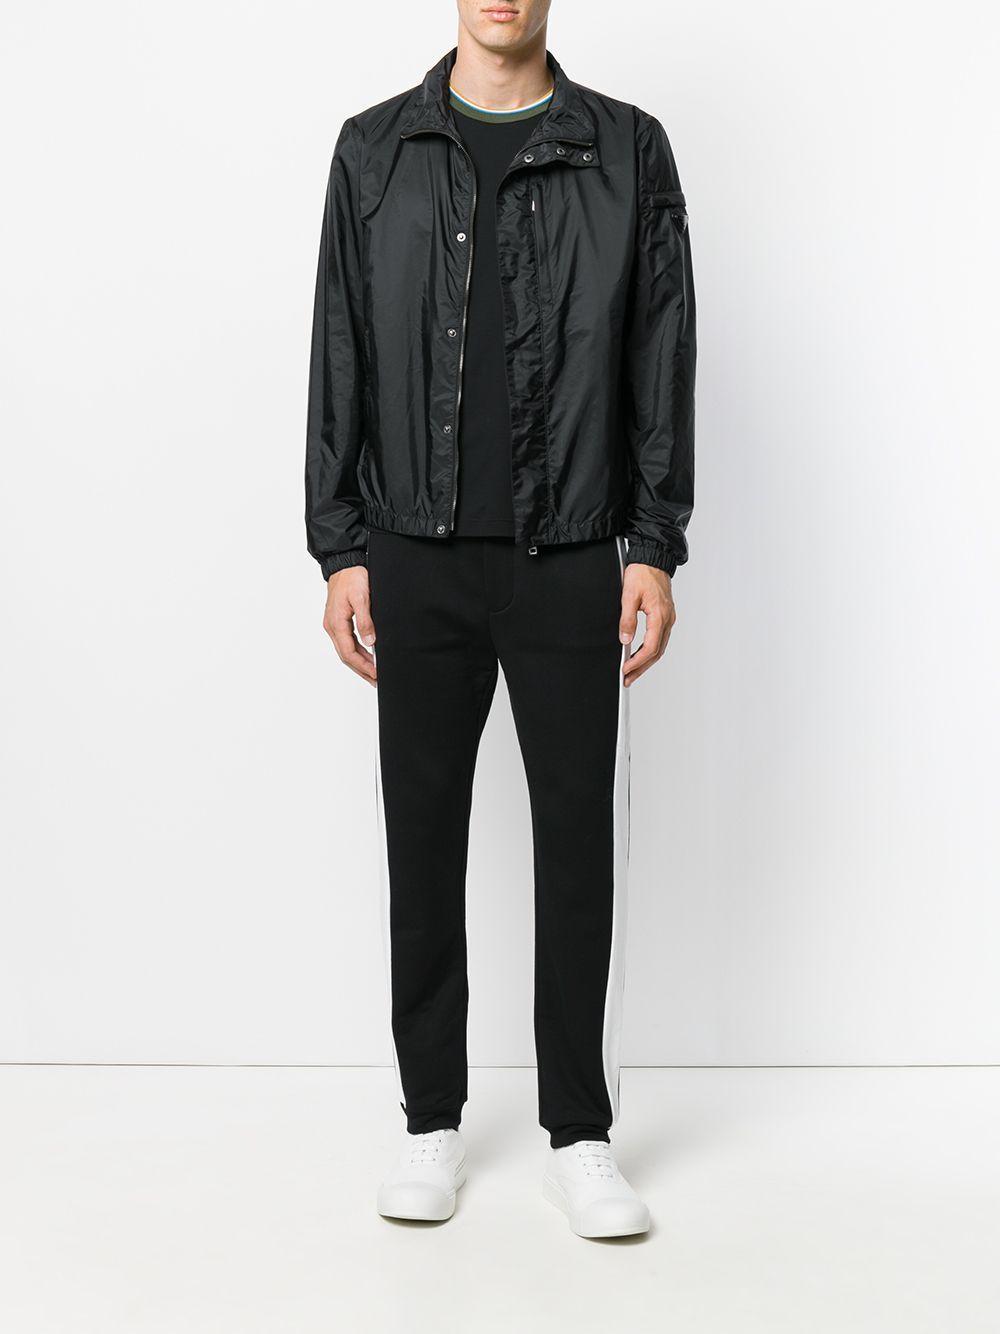 Prada Synthetic Logo Plaque Bomber Jacket in Black for Men